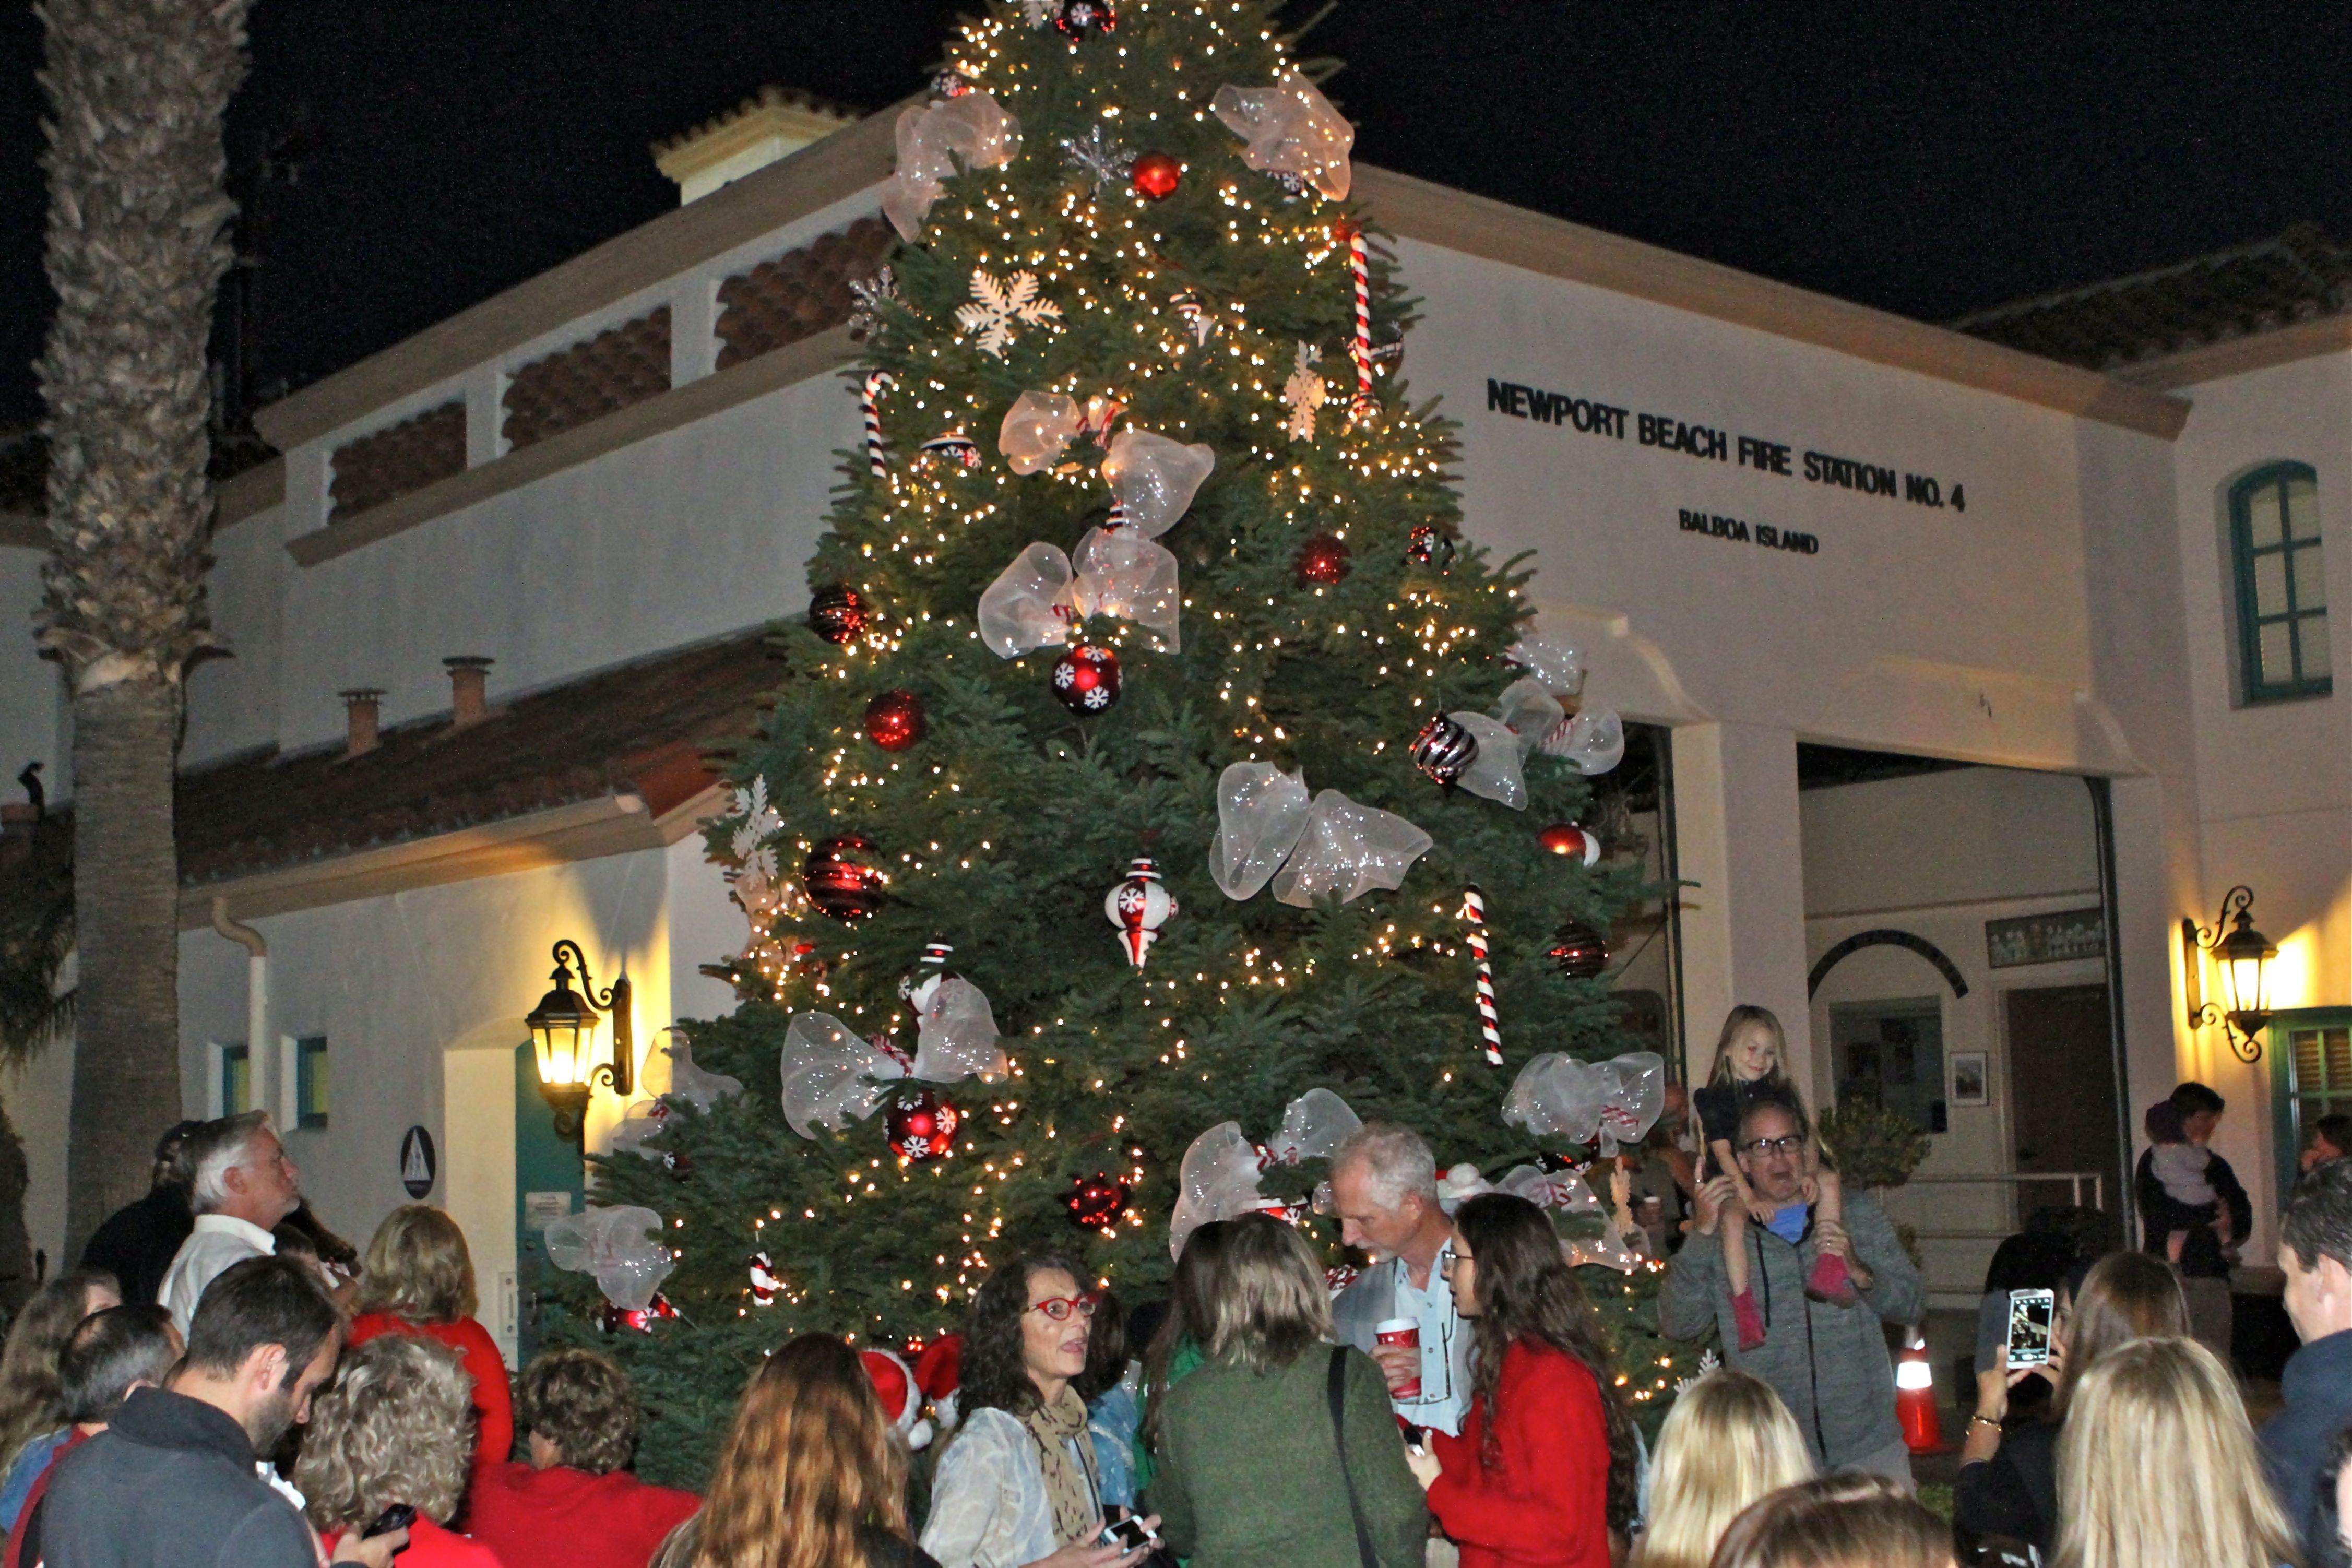 Island Christmas Tree.Balboa Island Tree Lighting Newport Beach News